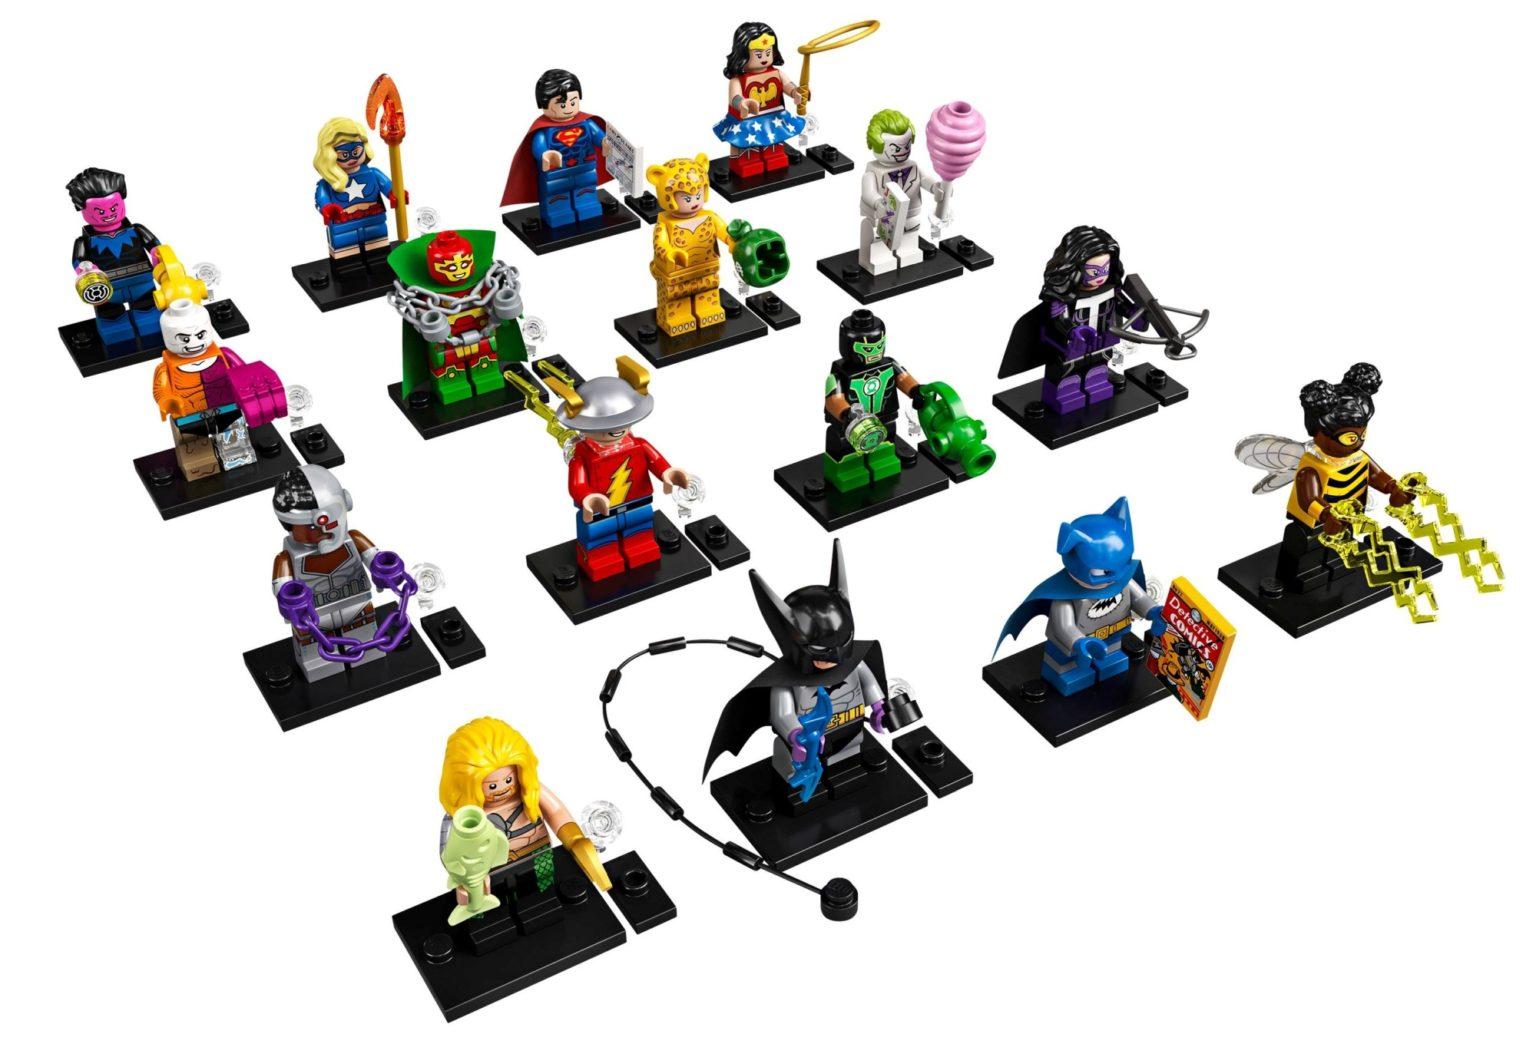 lego-dc-minifigures-serie-2020-71026-0001-1536x1054